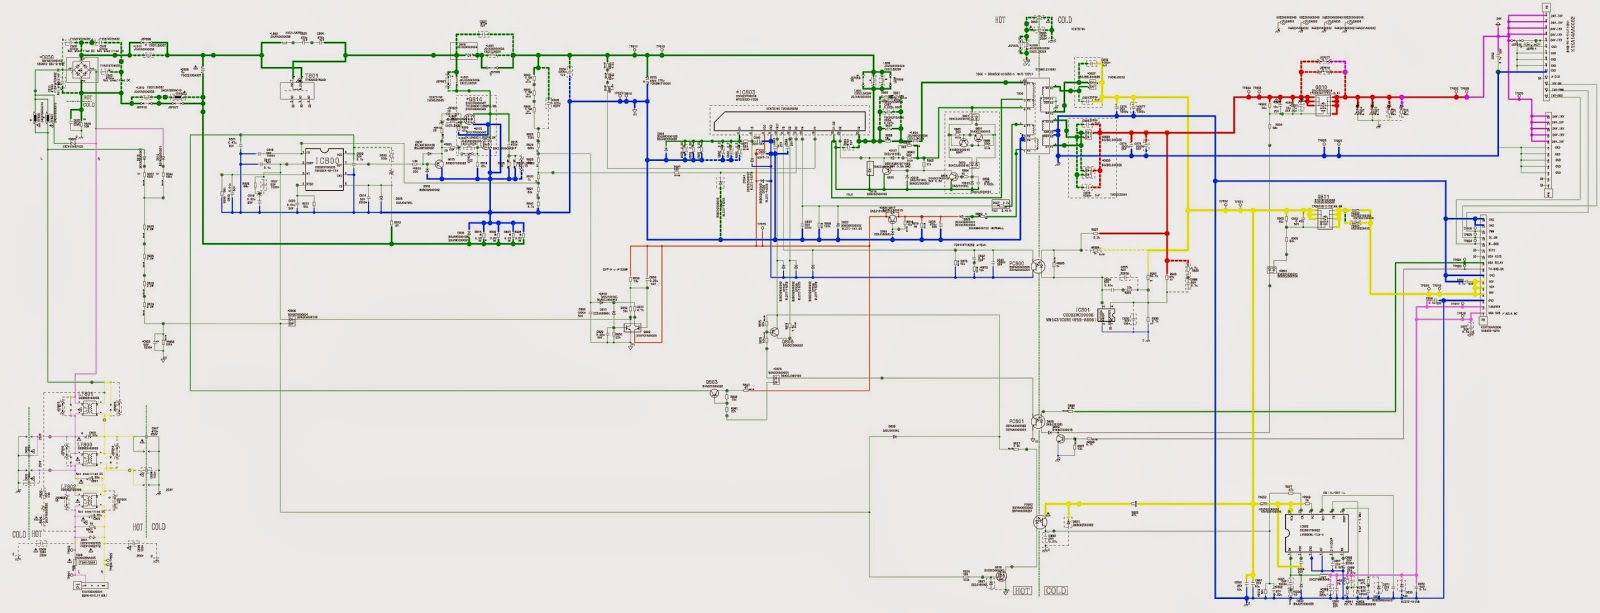 PANASONIC TCL42U30B LCD TV  POWER SUPPLY CIRCUIT DIAGRAM